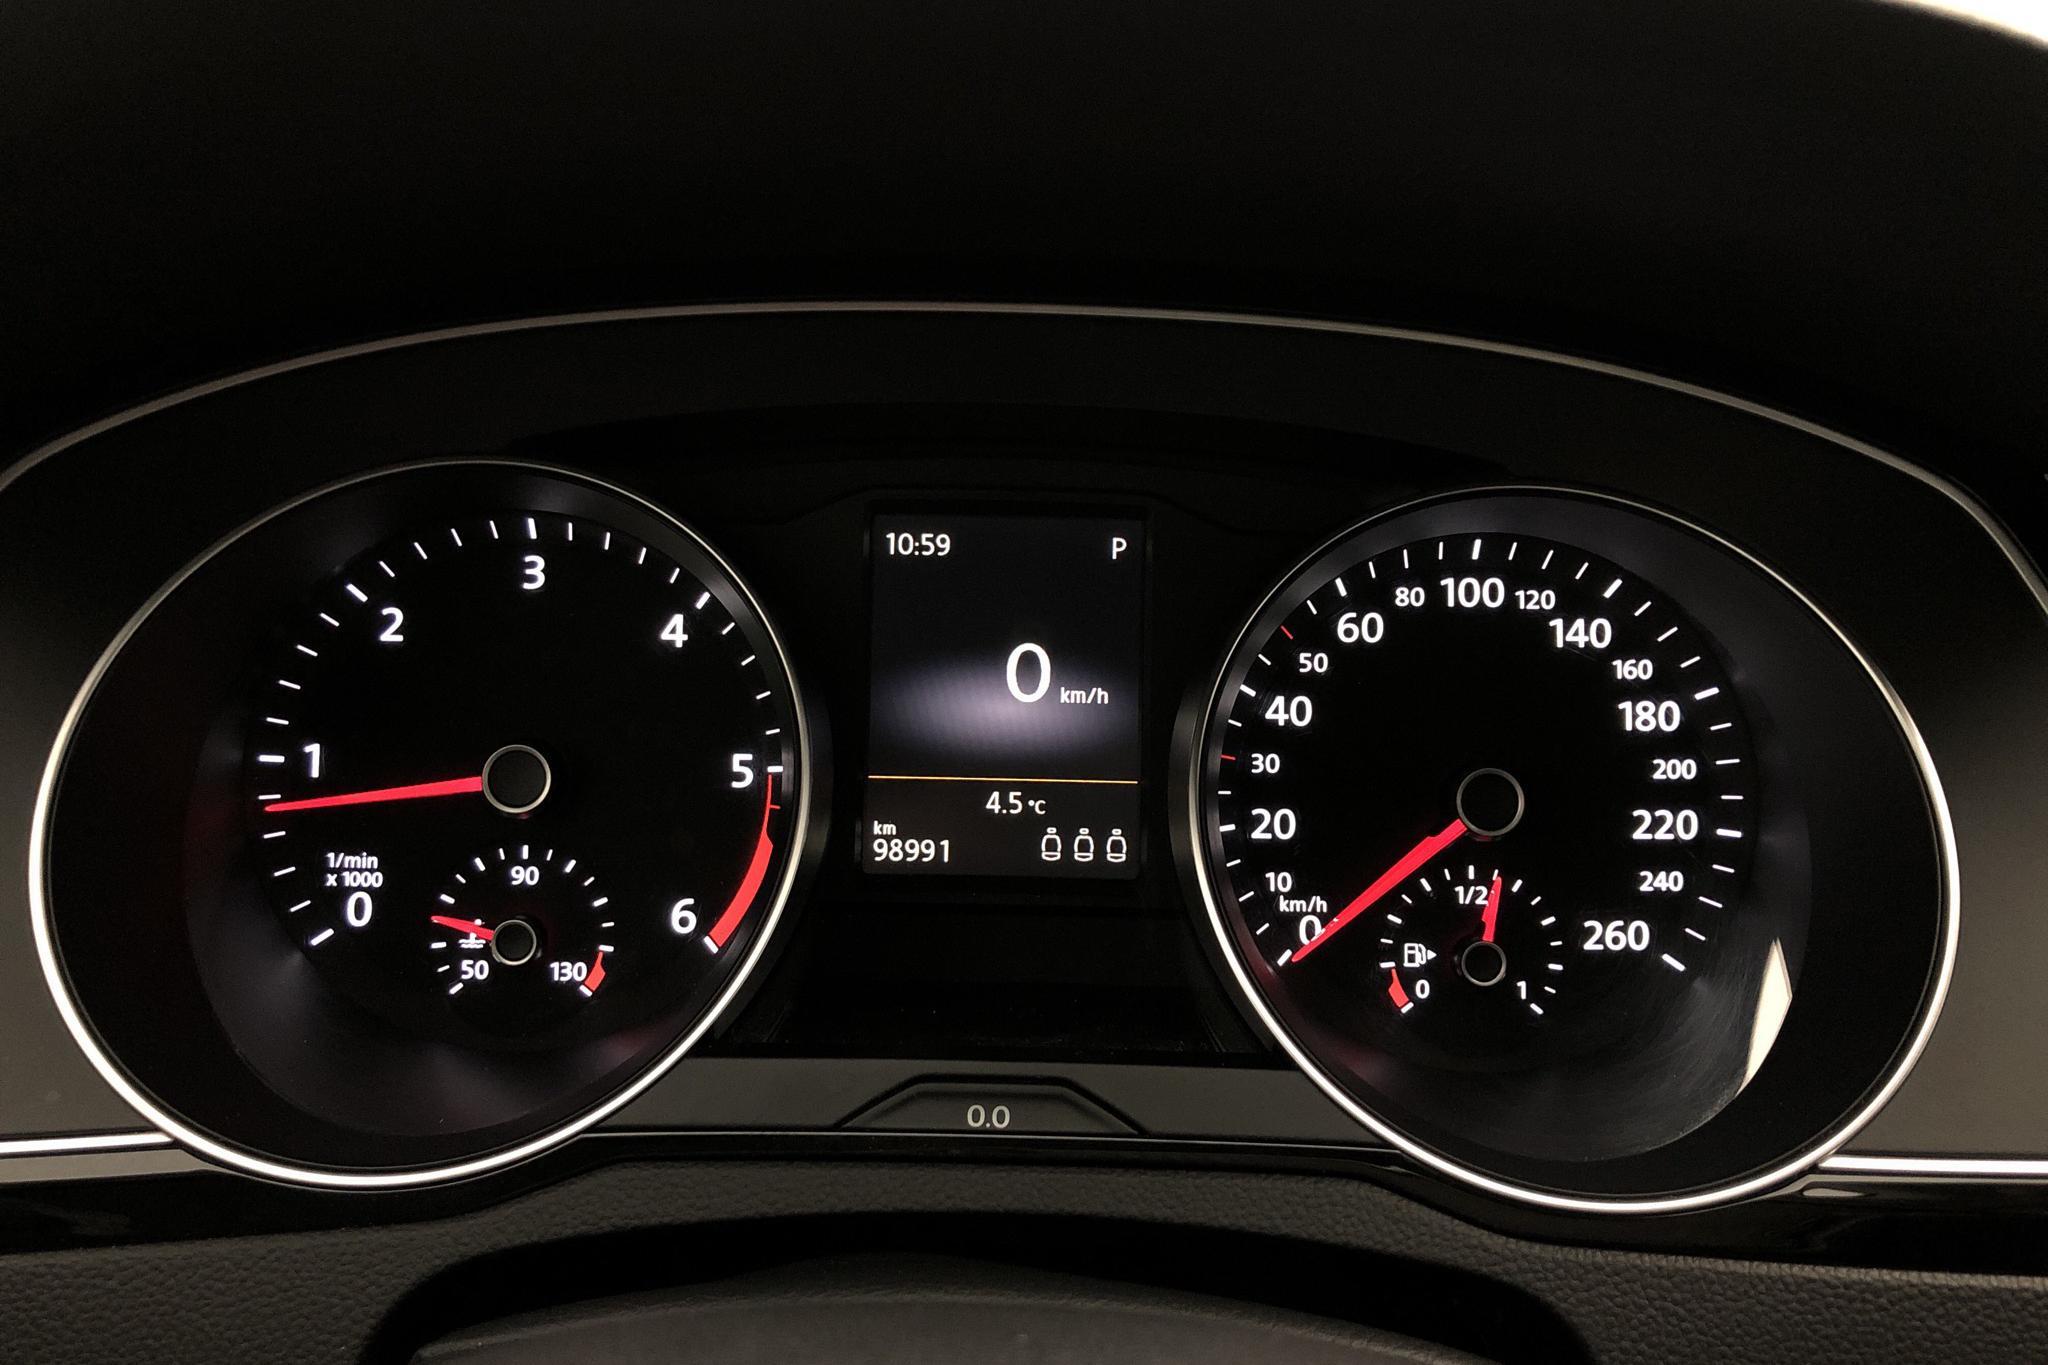 VW Passat Alltrack 2.0 TDI Sportscombi 4MOTION (190hk) - 98 990 km - Automatic - black - 2016